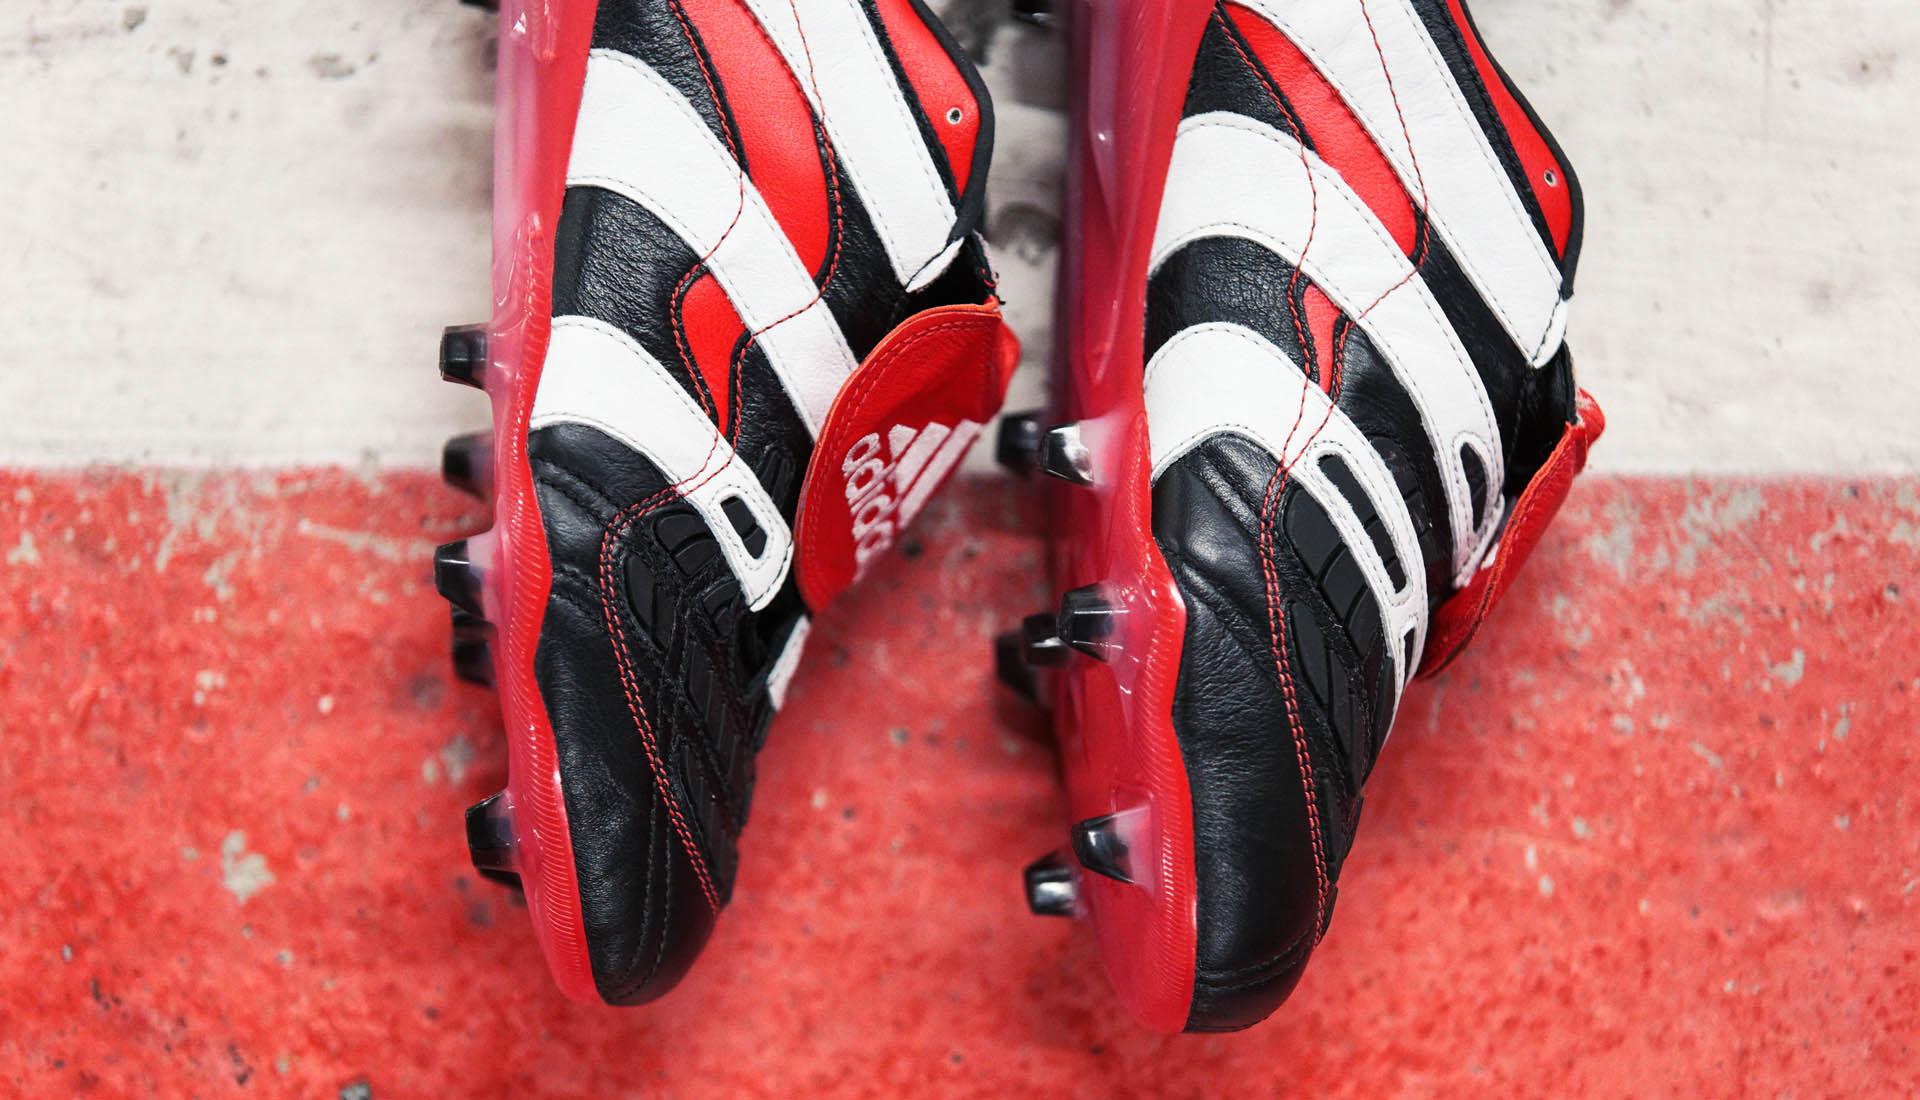 scarpe calcio piu belle 2018 predator accelerator 98